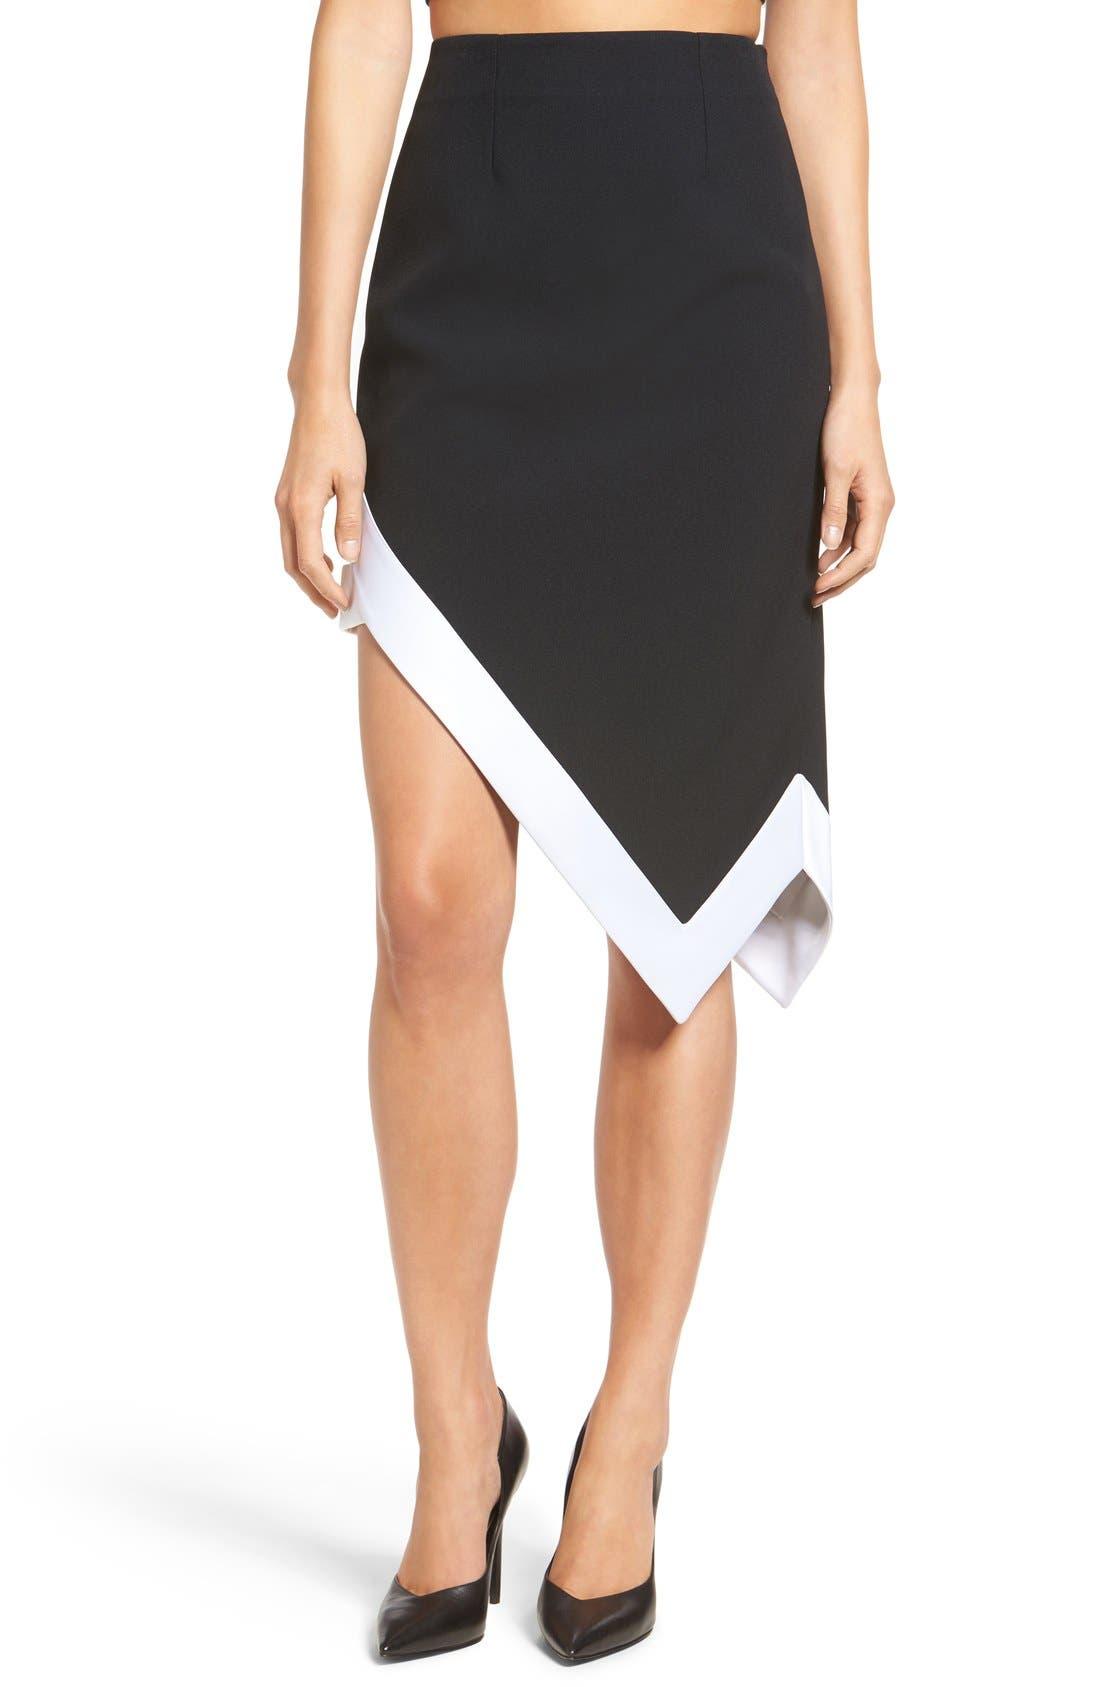 Alternate Image 1 Selected - KENDALL + KYLIE Satin Trim Asymmetrical Skirt